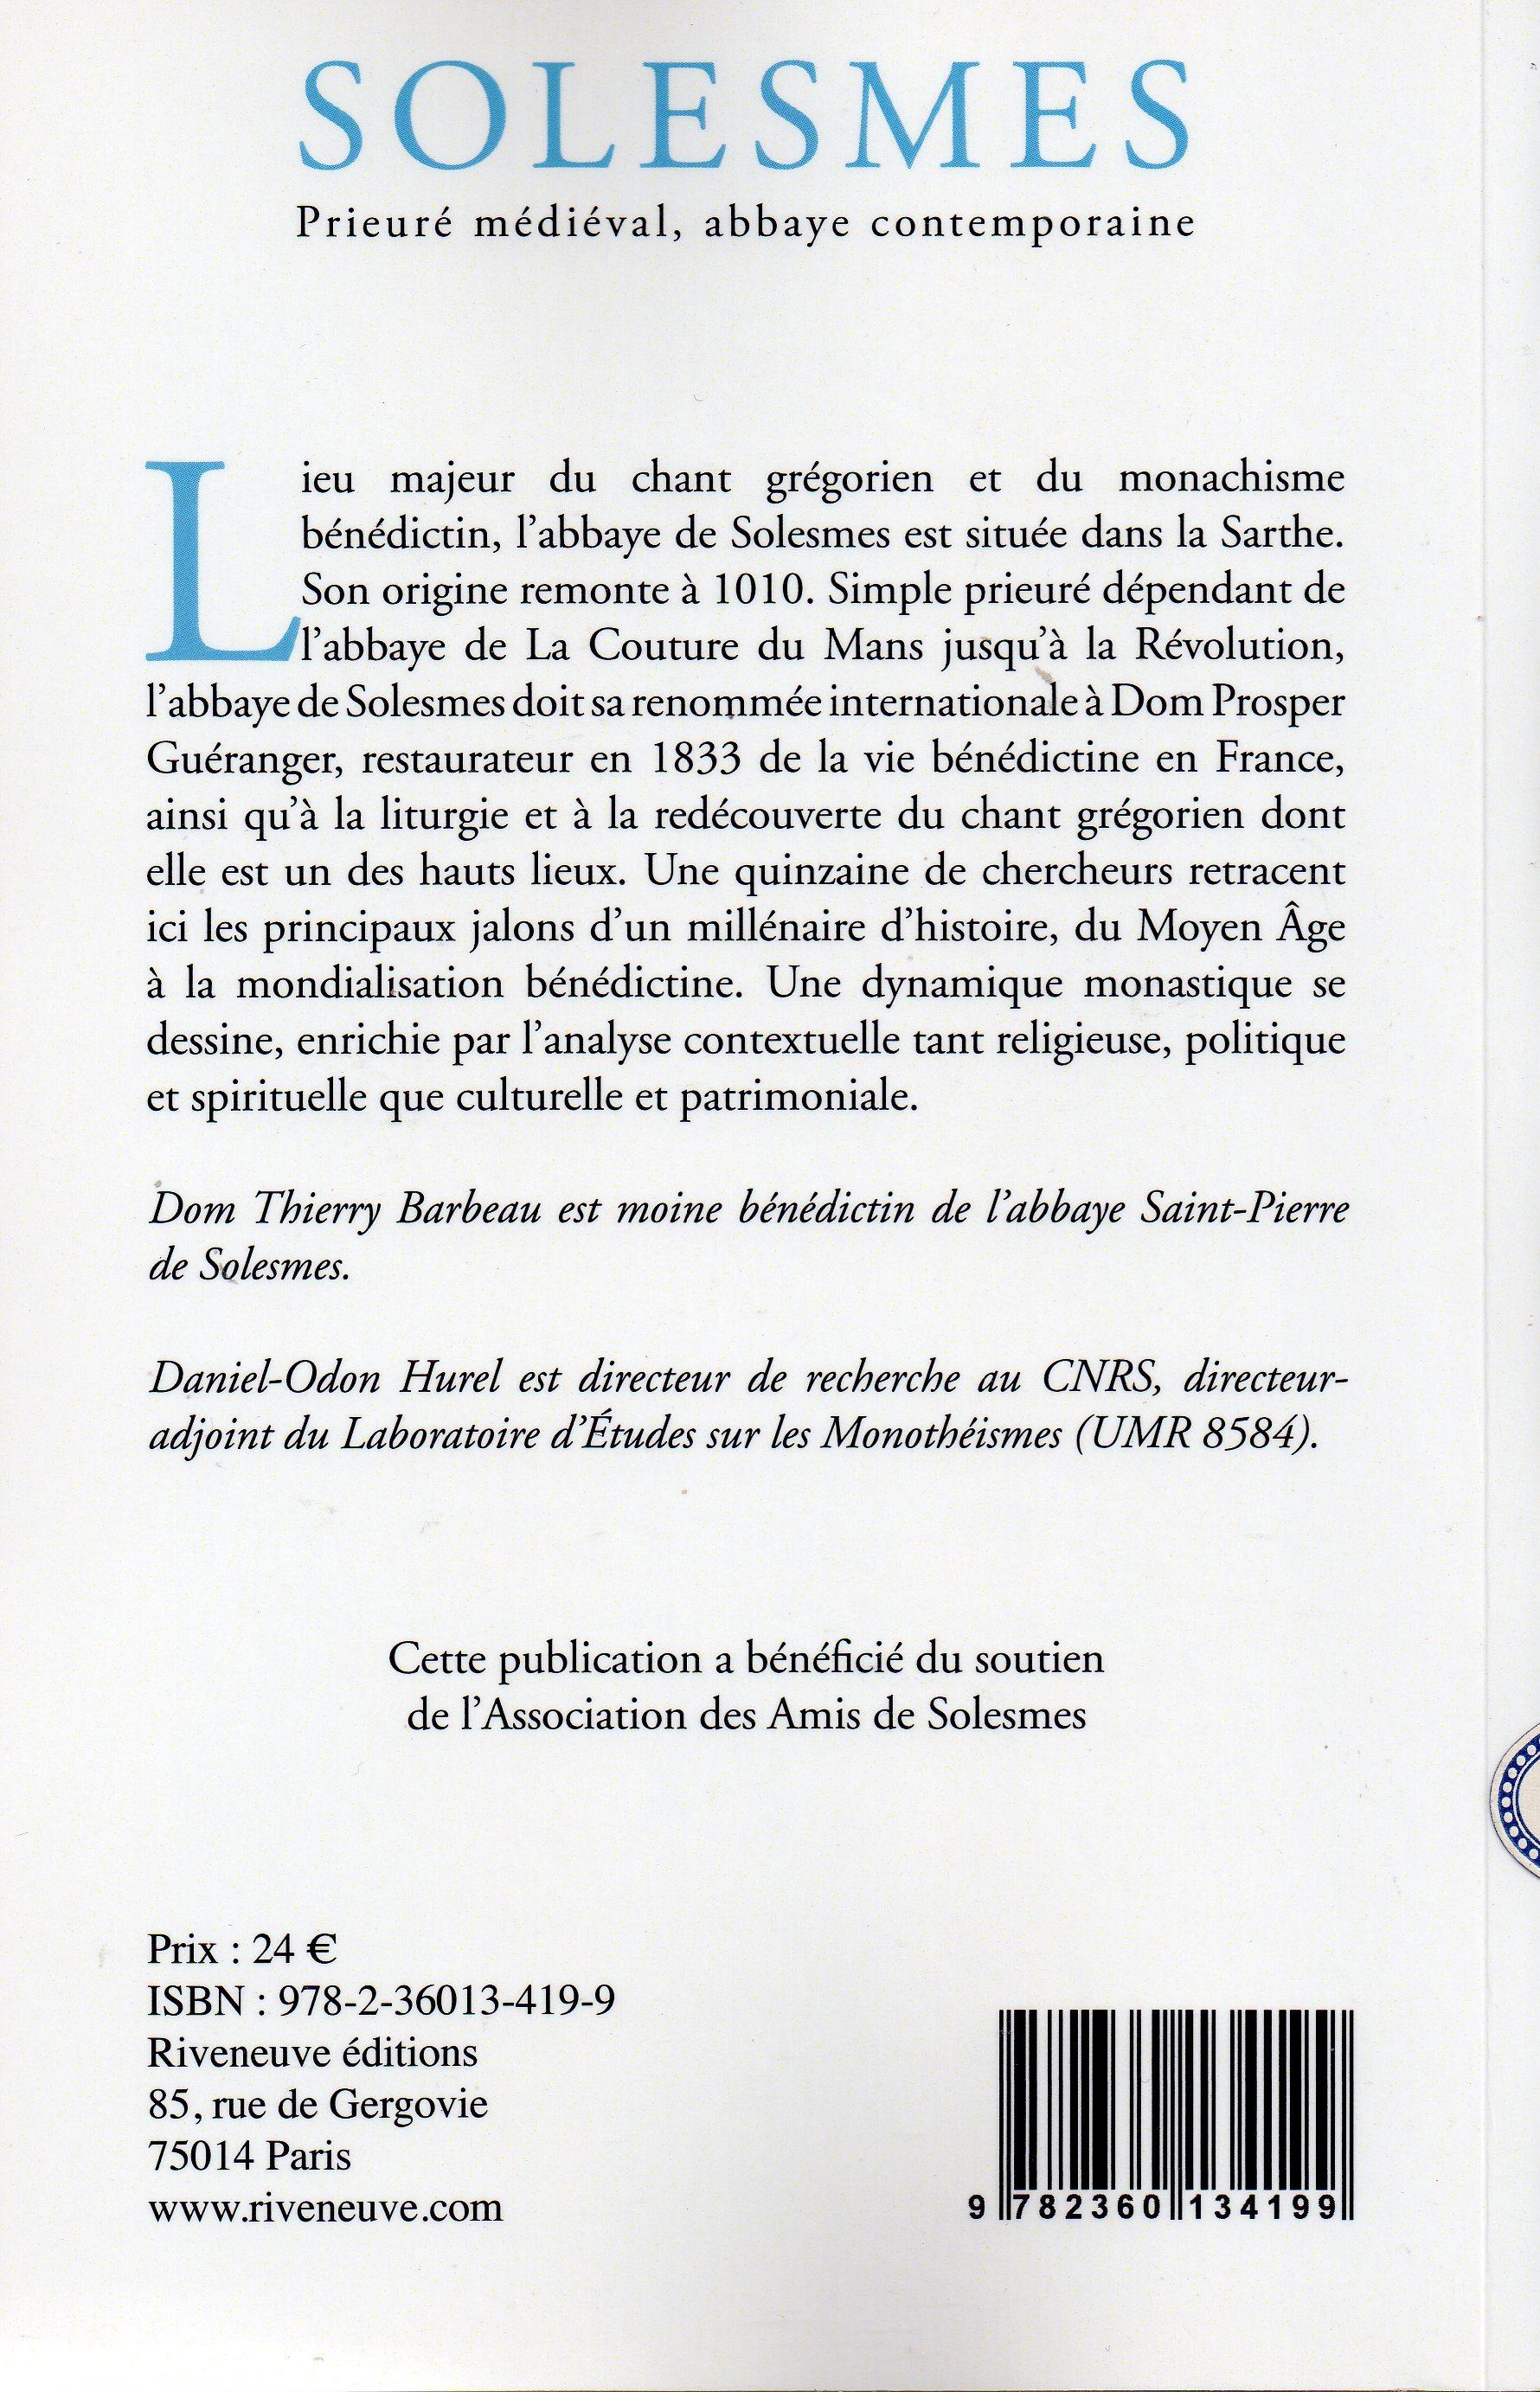 https://www.blog4ever-fichiers.com/2015/02/794874/Solesmes-2.jpg